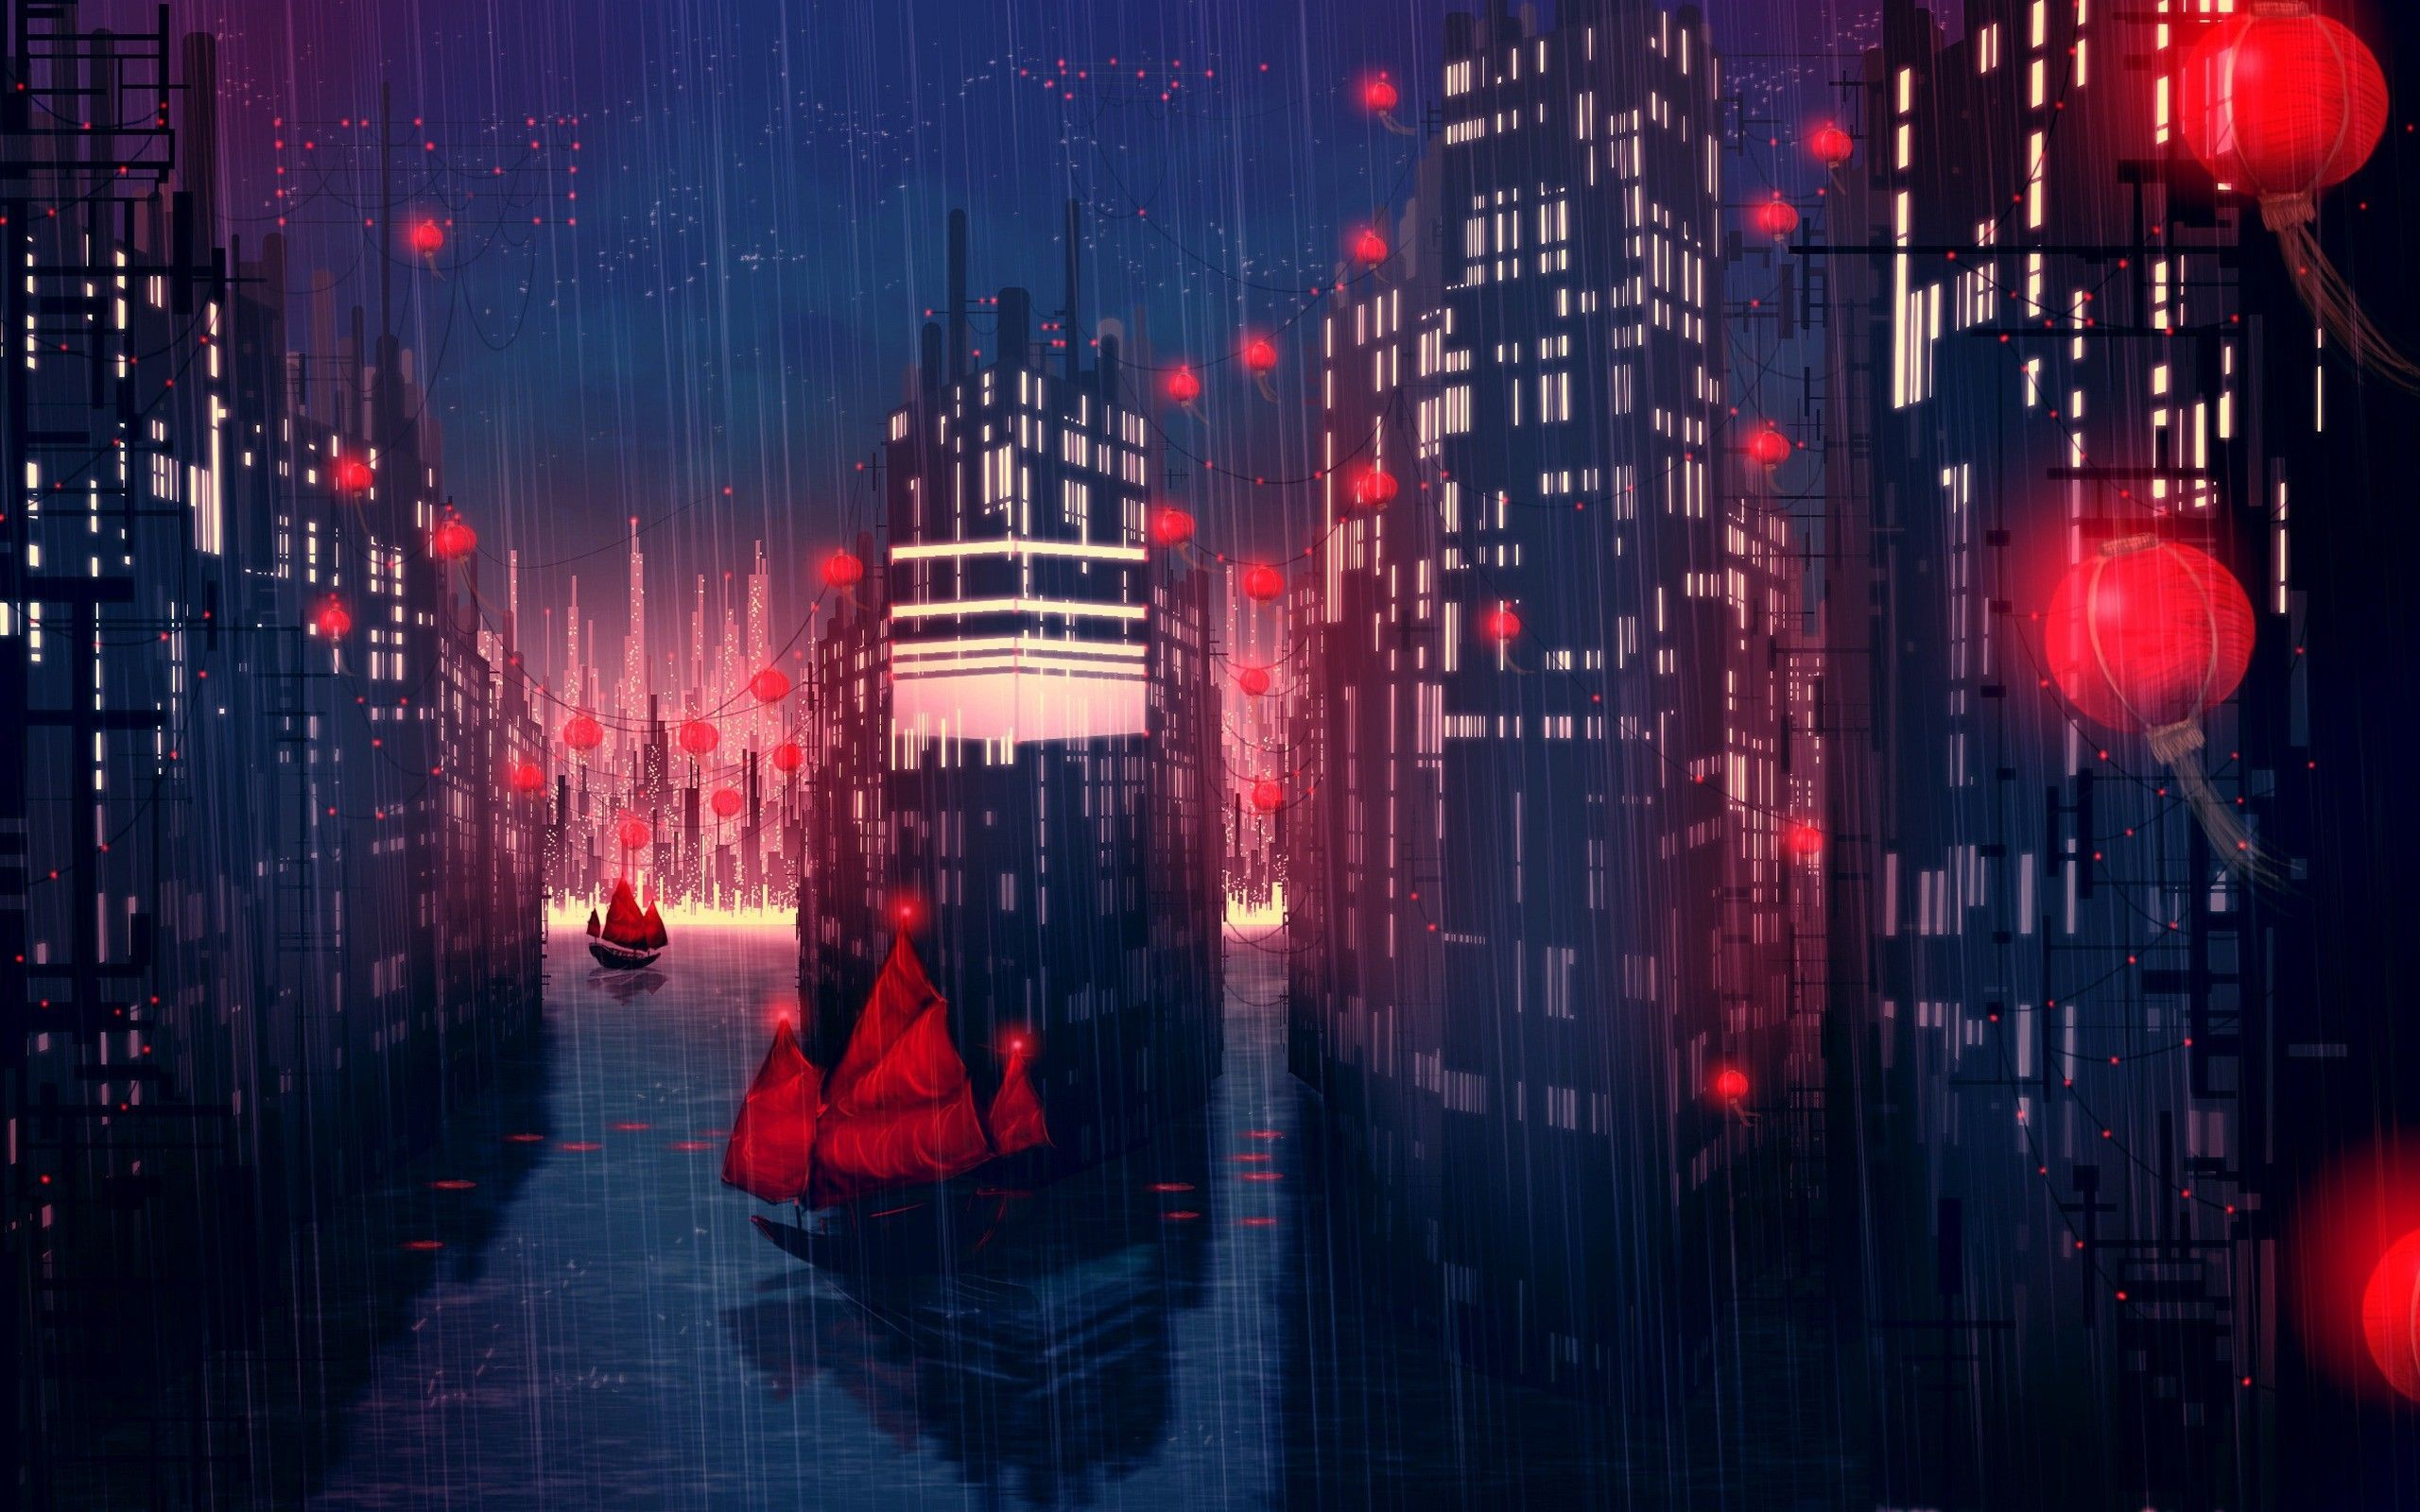 Anime City Night Scenery Wallpapers Top Free Anime City Night